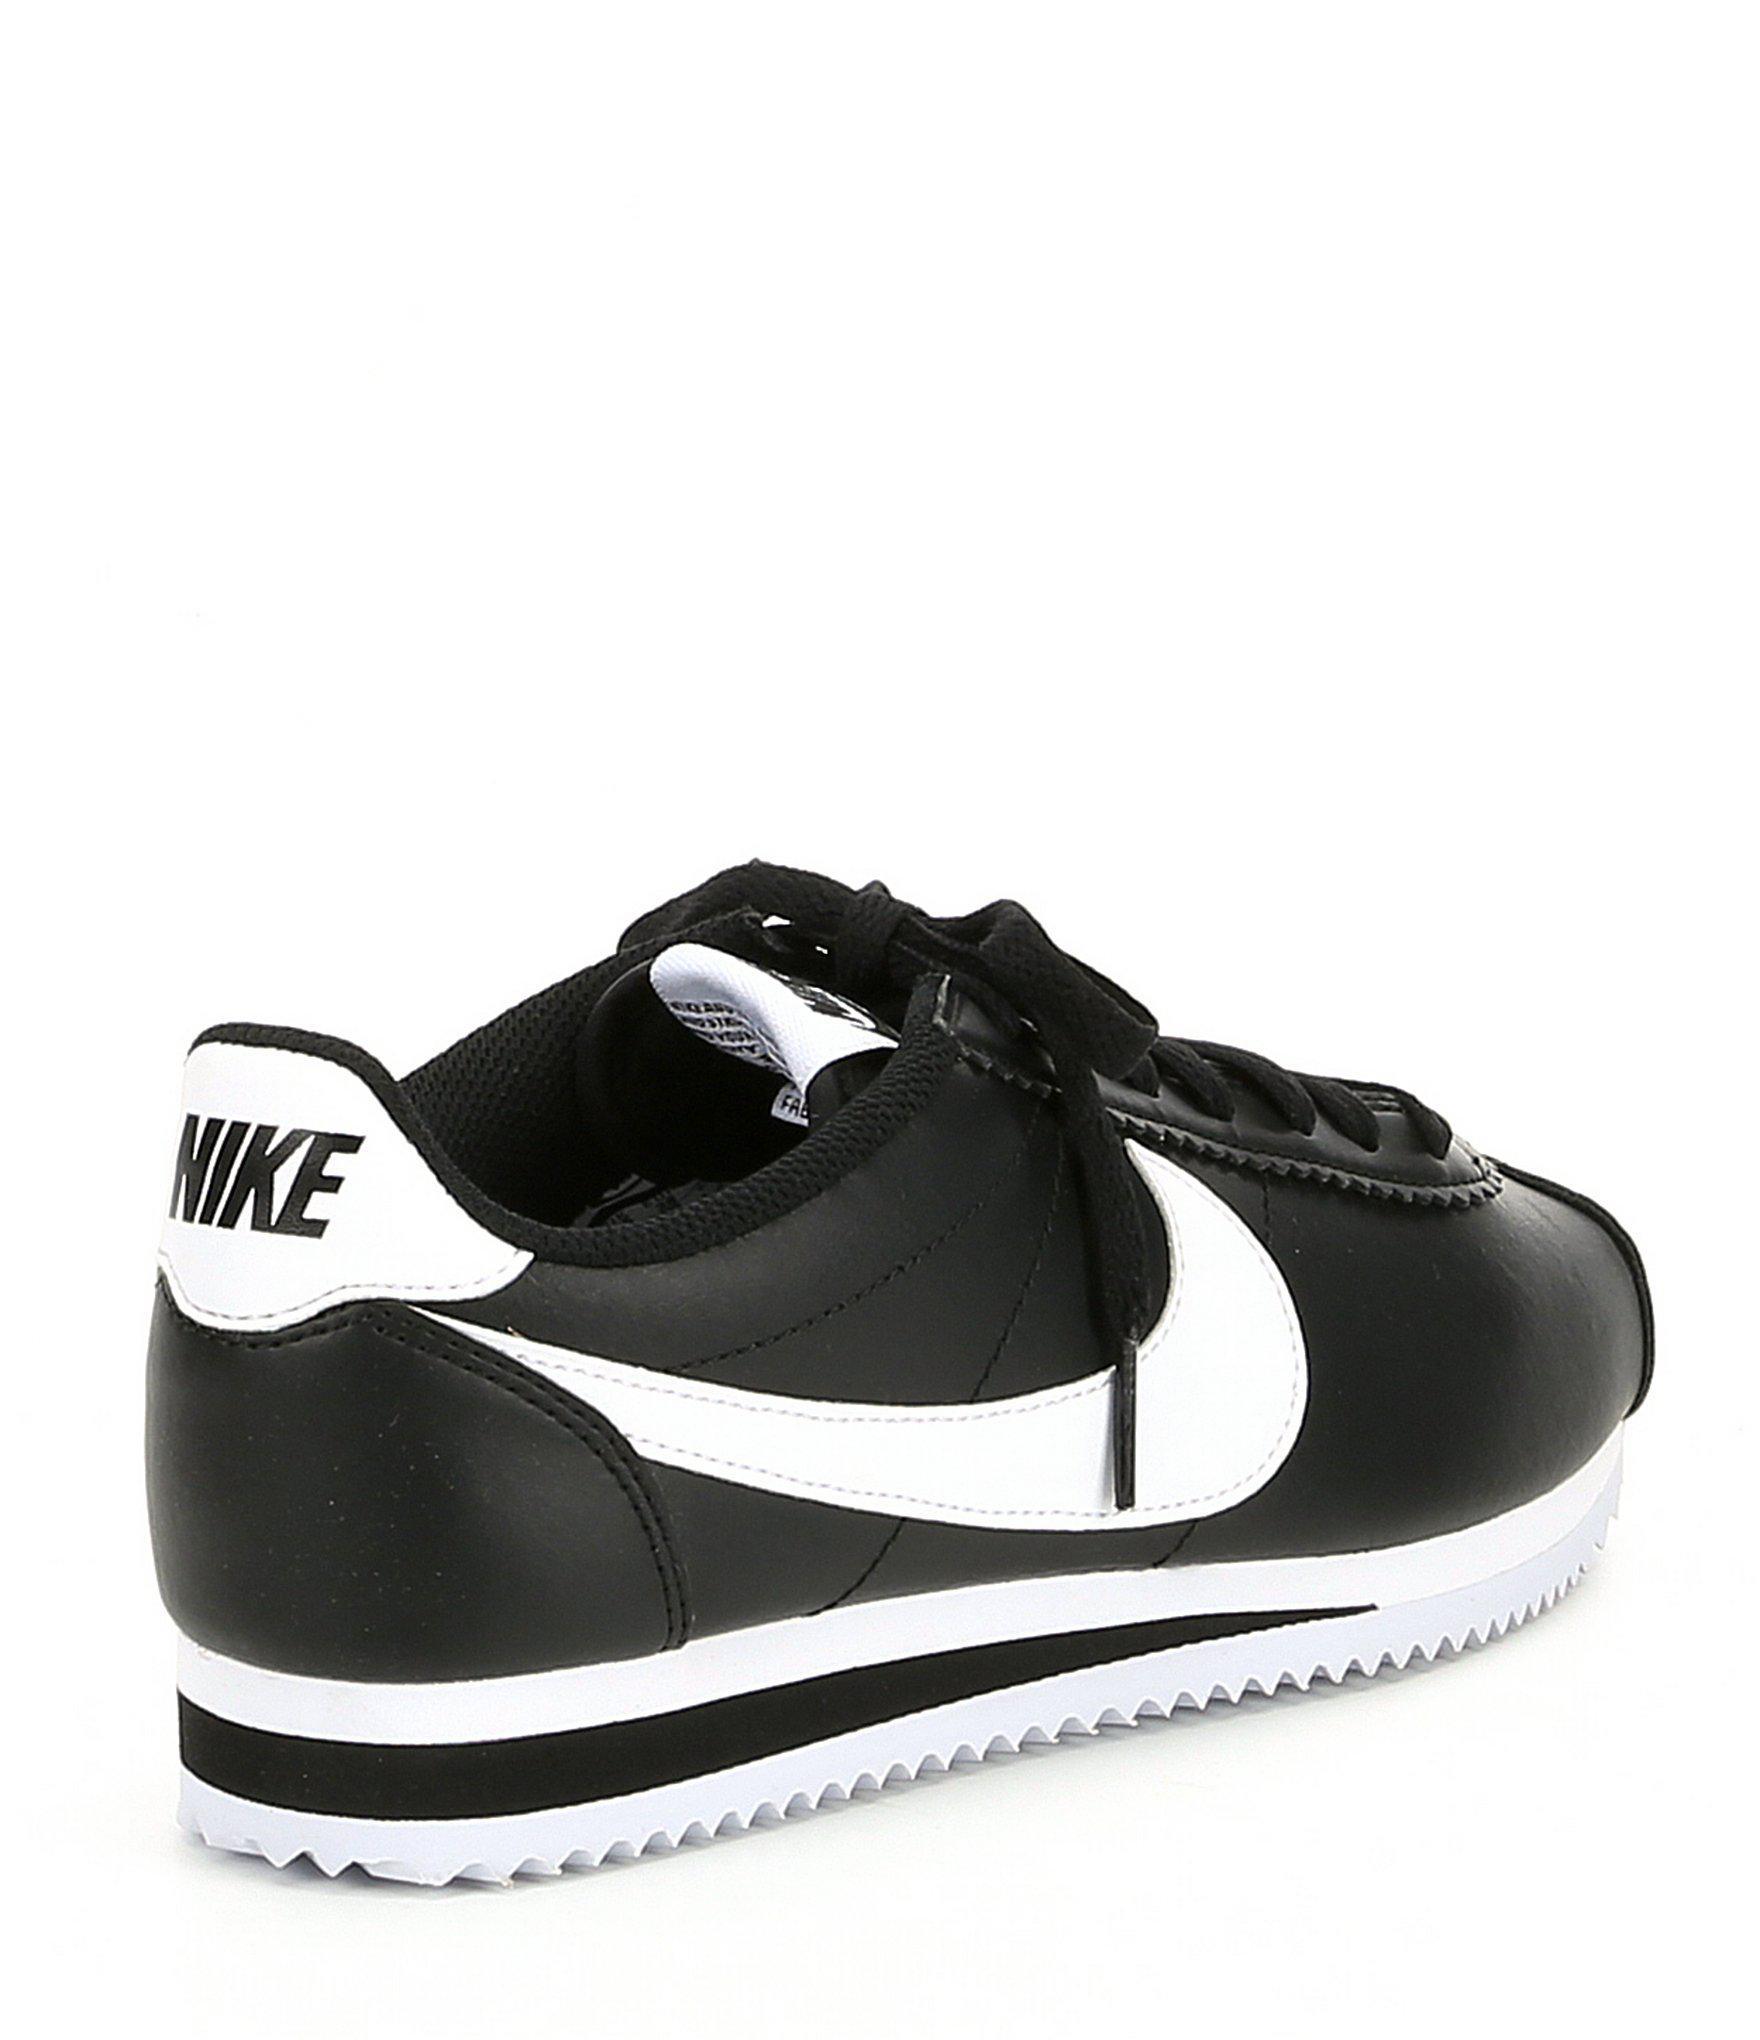 9304b5e14f02 Nike - Black Women s Classic Cortez Leather Lifestyle Shoe - Lyst. View  fullscreen